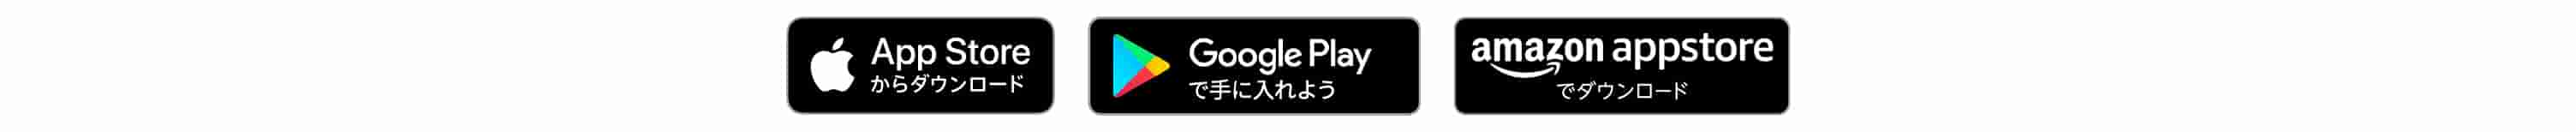 App Store, Google Play, Amazon Appstore